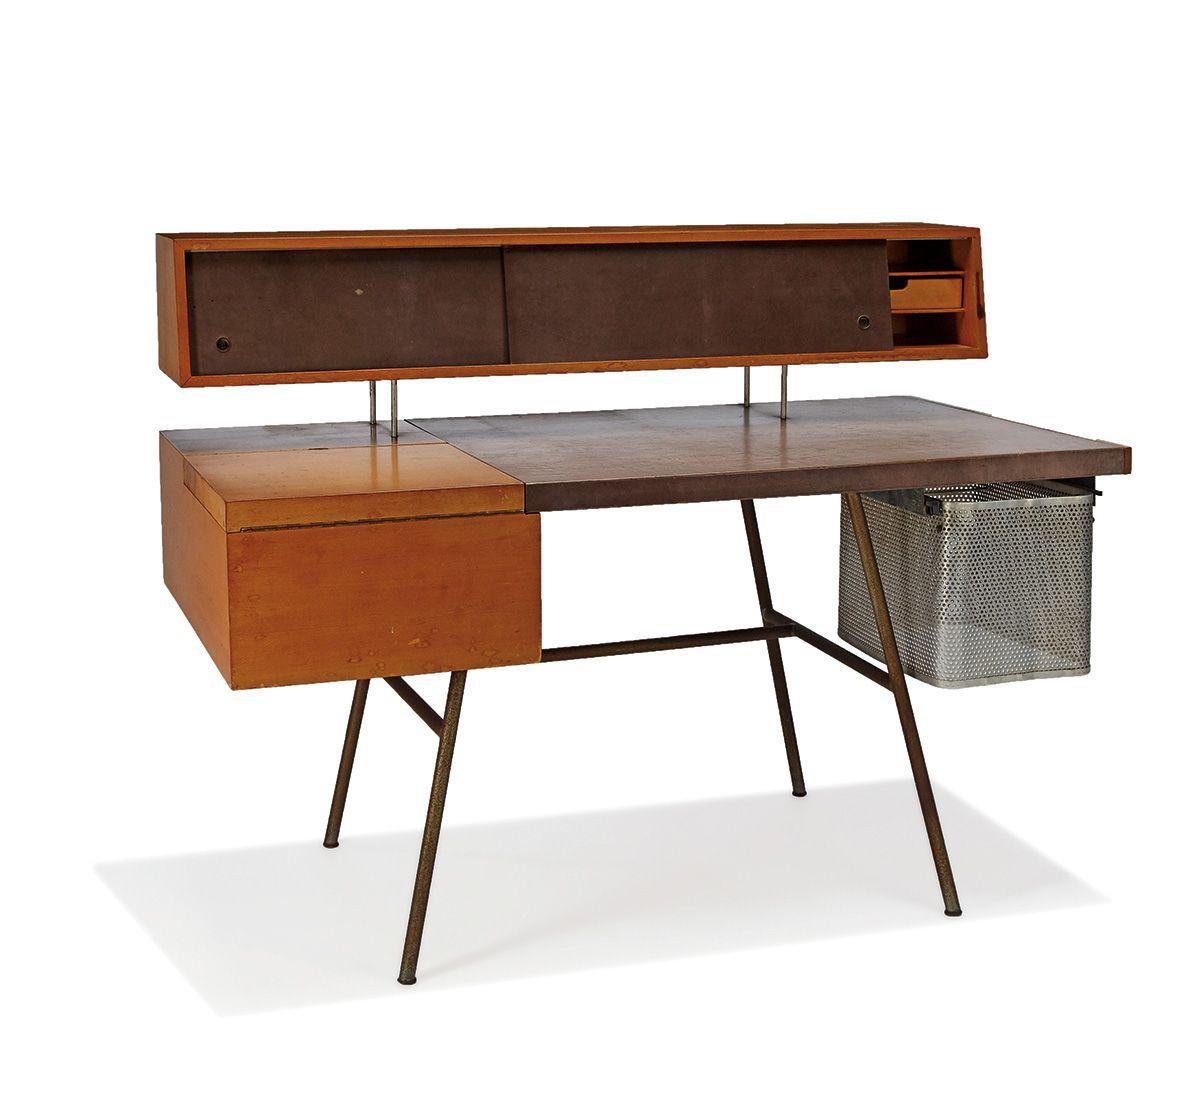 "George Nelson Home Office desk Designed 1946 Model no. 4658 Herman Miller Retains silver manufacturer's label 41"" x 54"" x 28"""